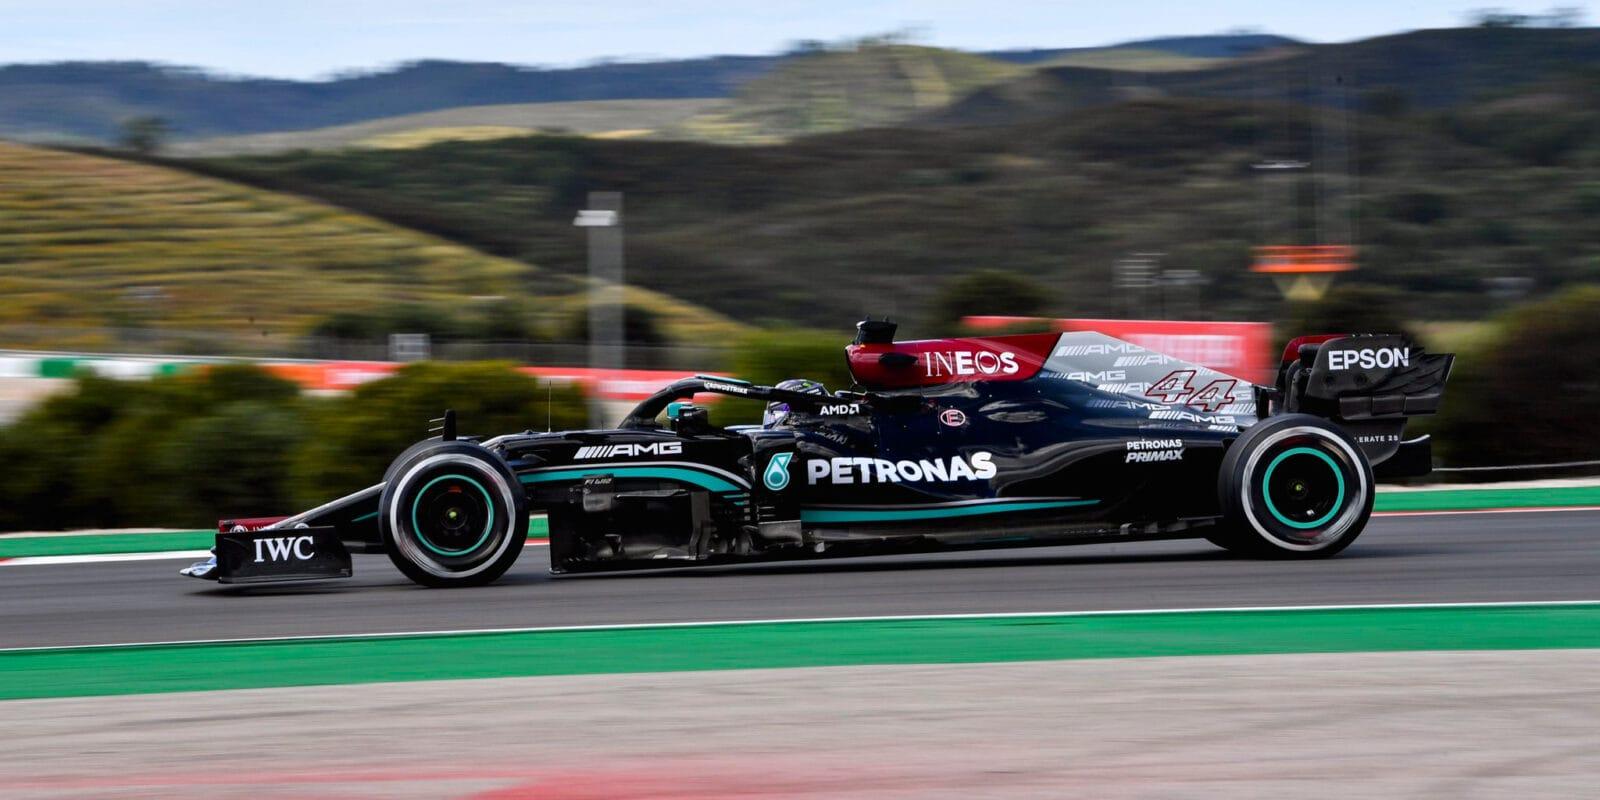 Druhý trénink v Portimãu ovládl Lewis Hamilton